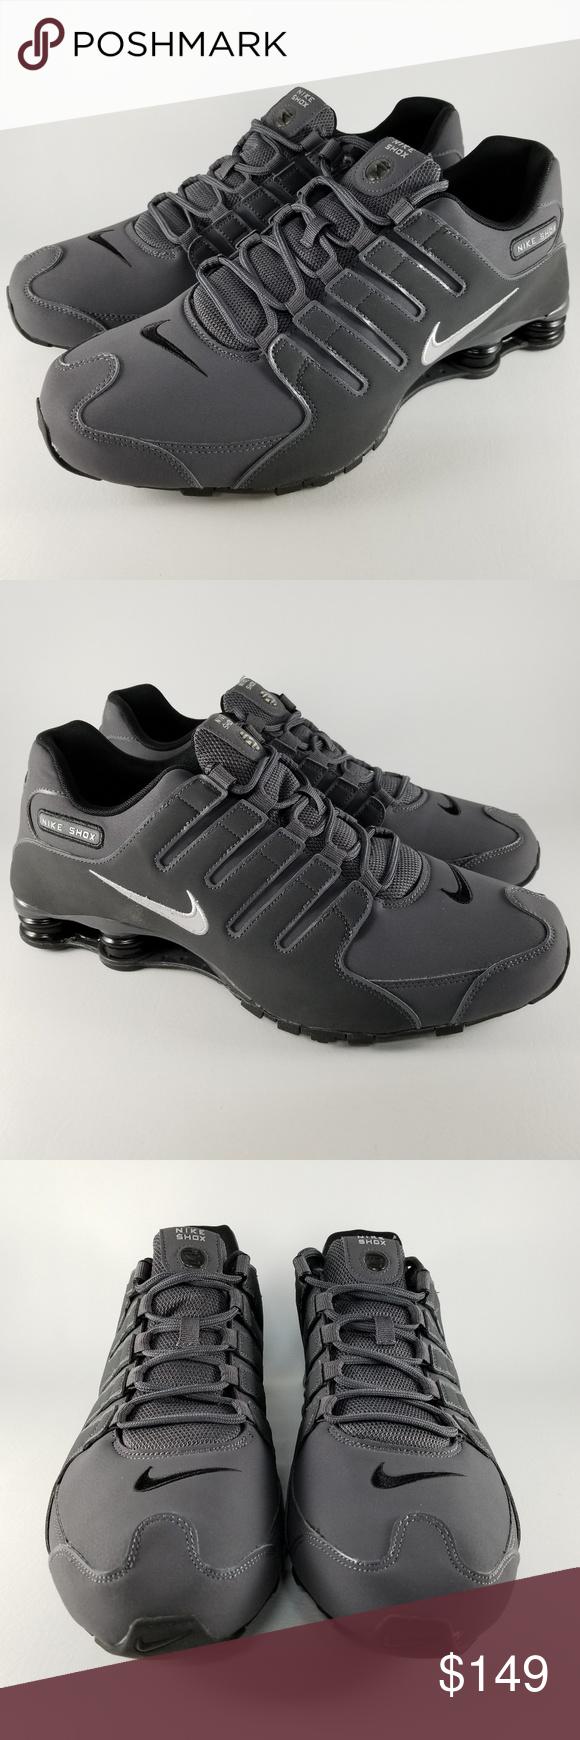 Nike Shox NZ Men s Running Athletic Shoes Grey 15 Nike Shox NZ Men s  Running Shoes Style 18735c50c